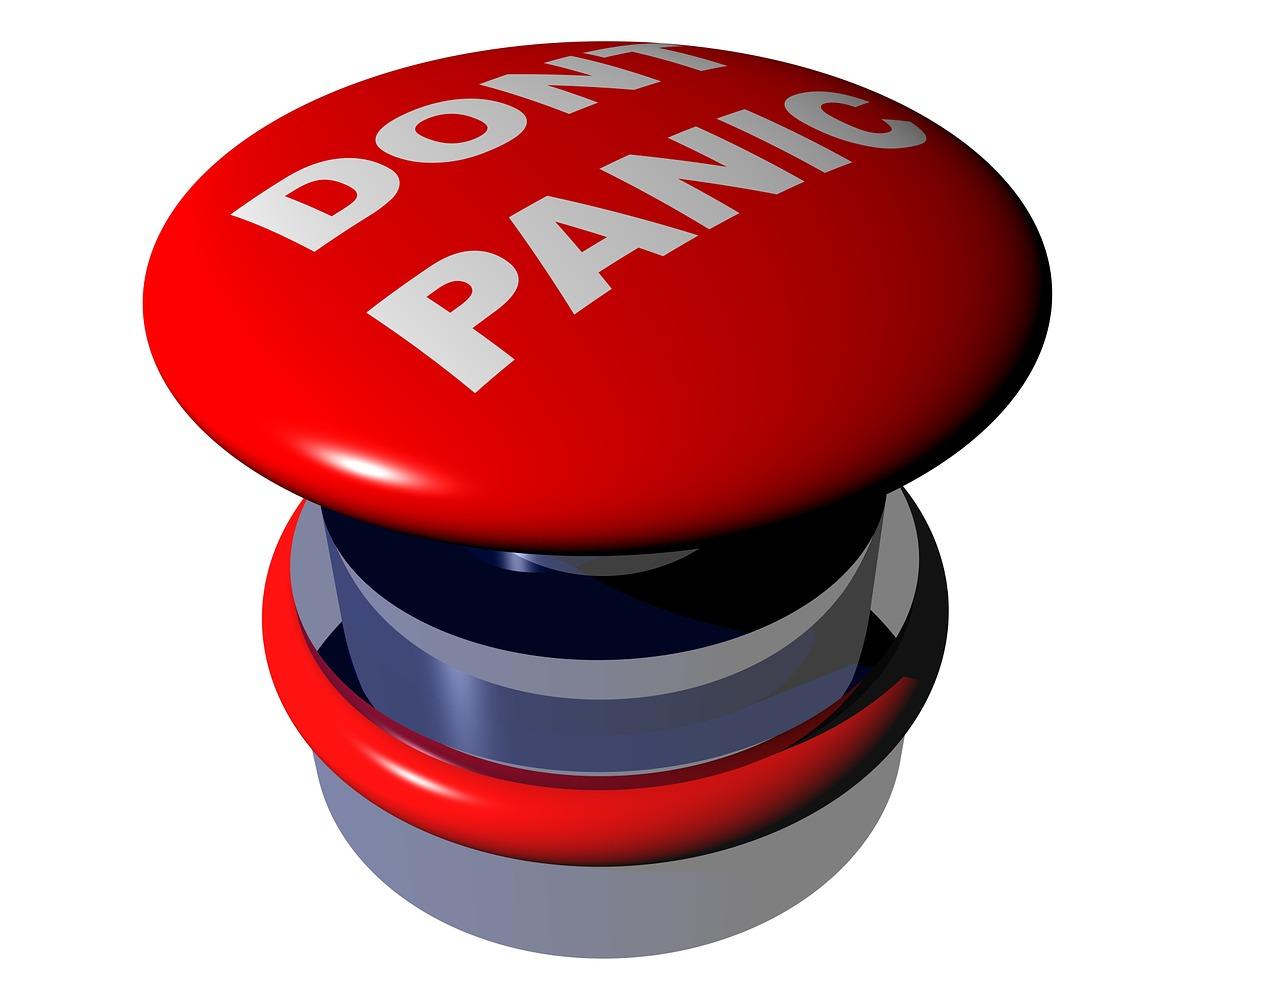 dont-panic-1067044_1280